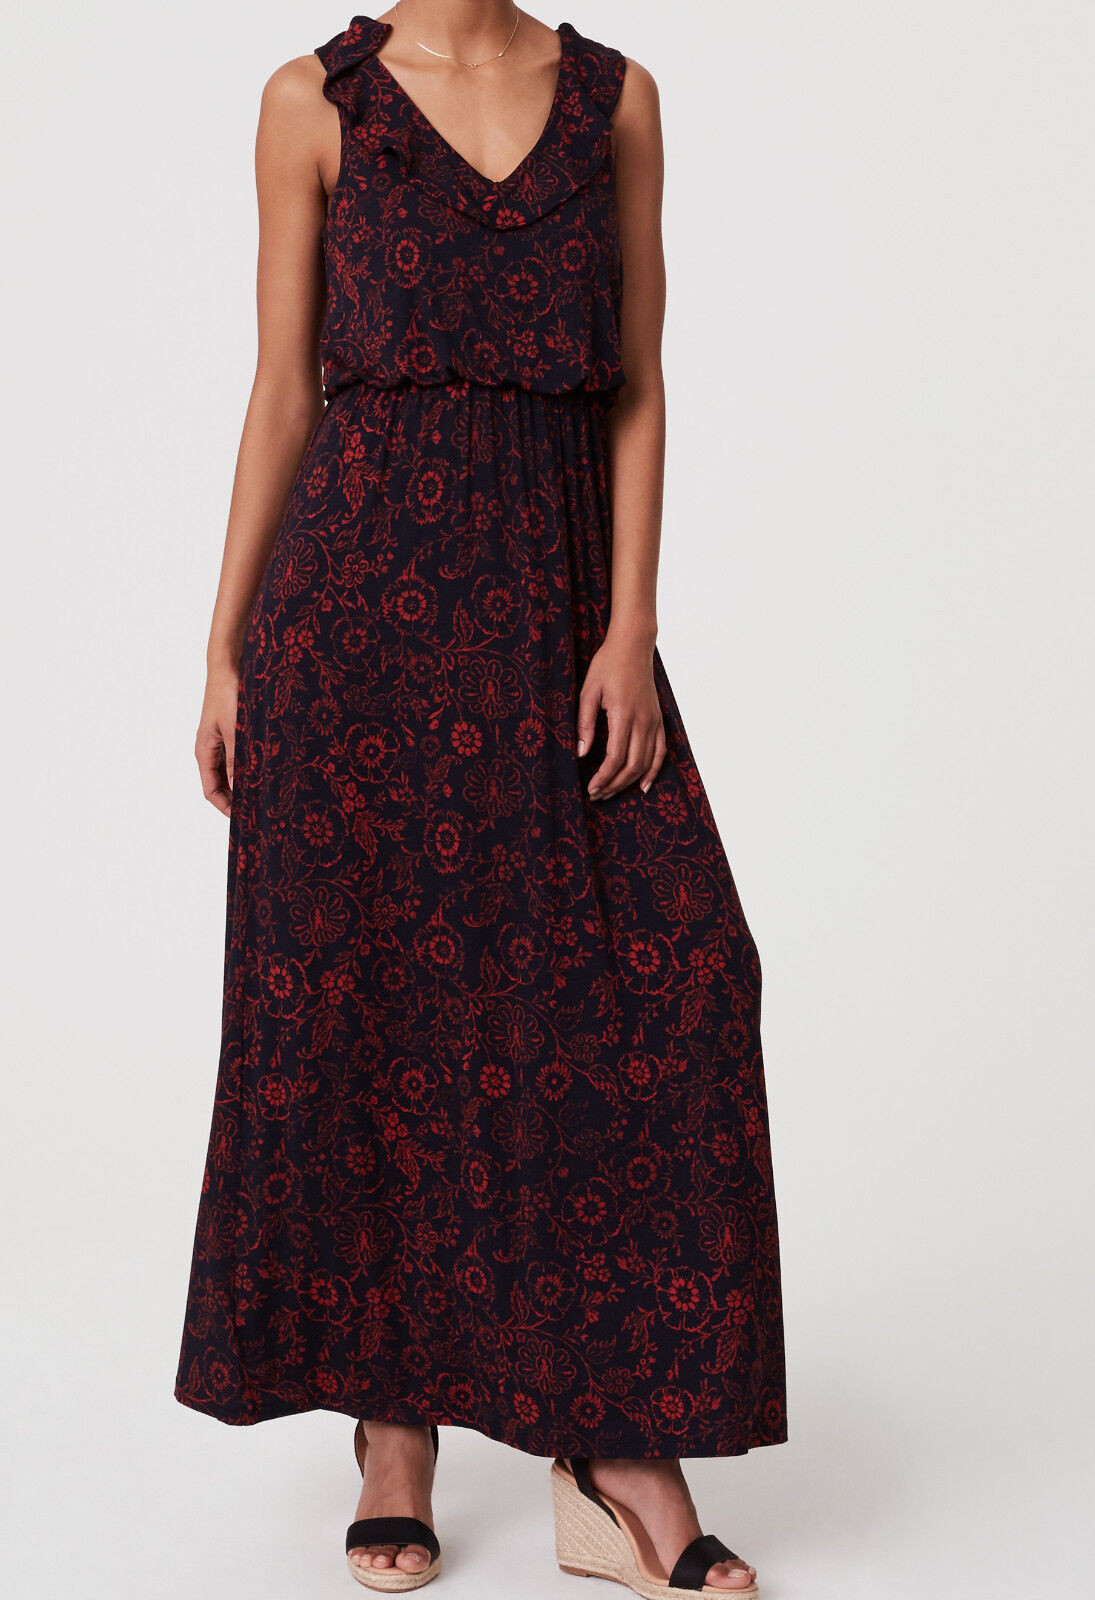 NWT Ann Taylor LOFT Floral Ruffle Maxi Dress Größe XS